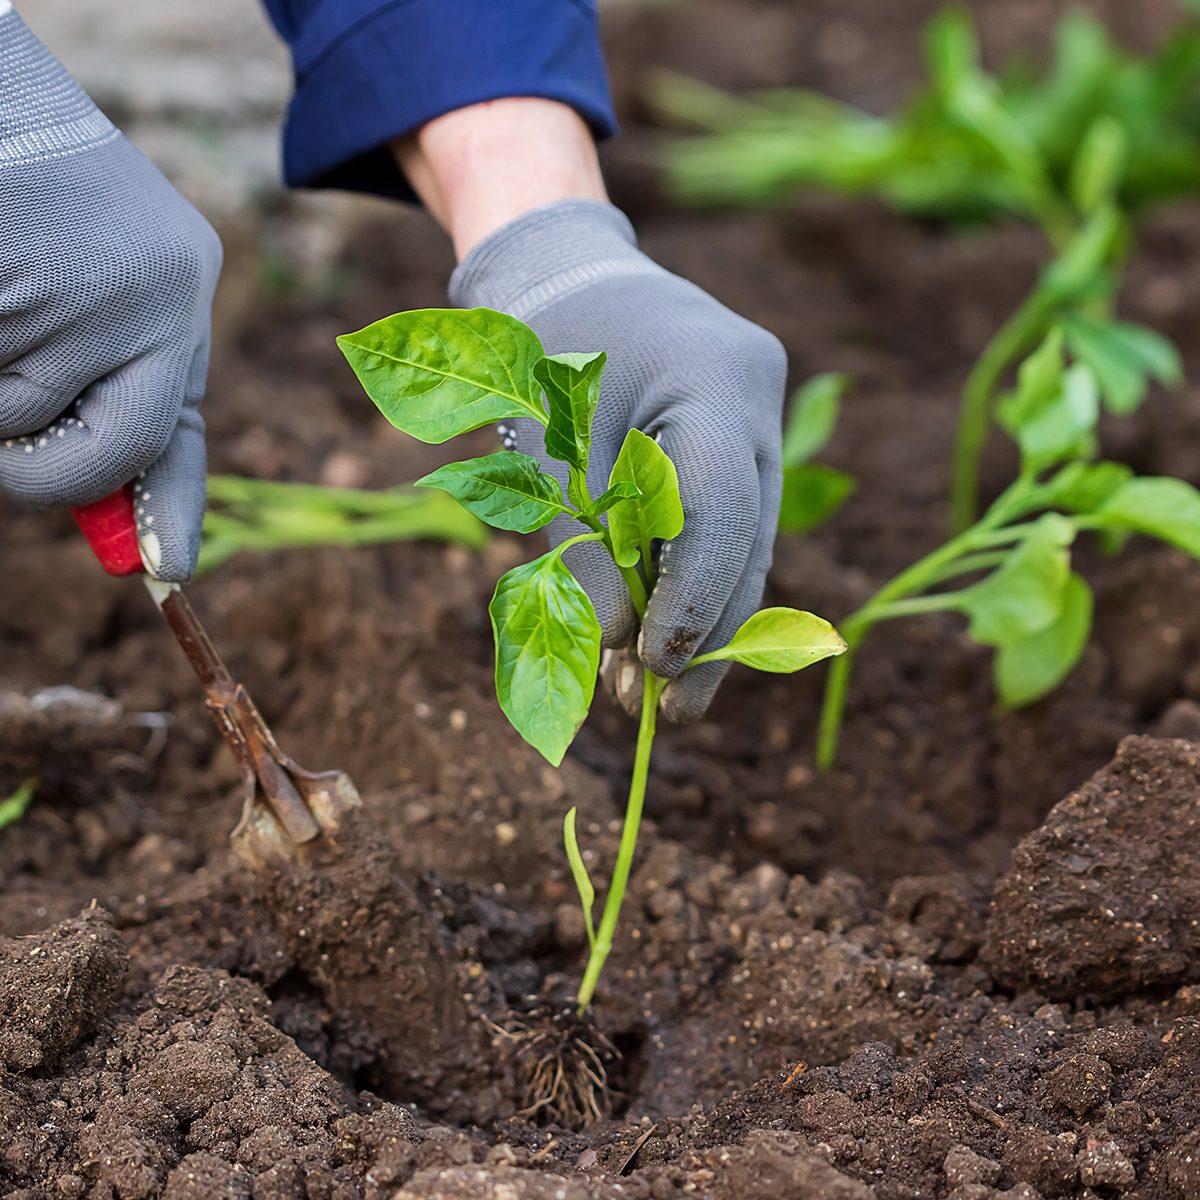 Seedlings pepper. Gardening work.